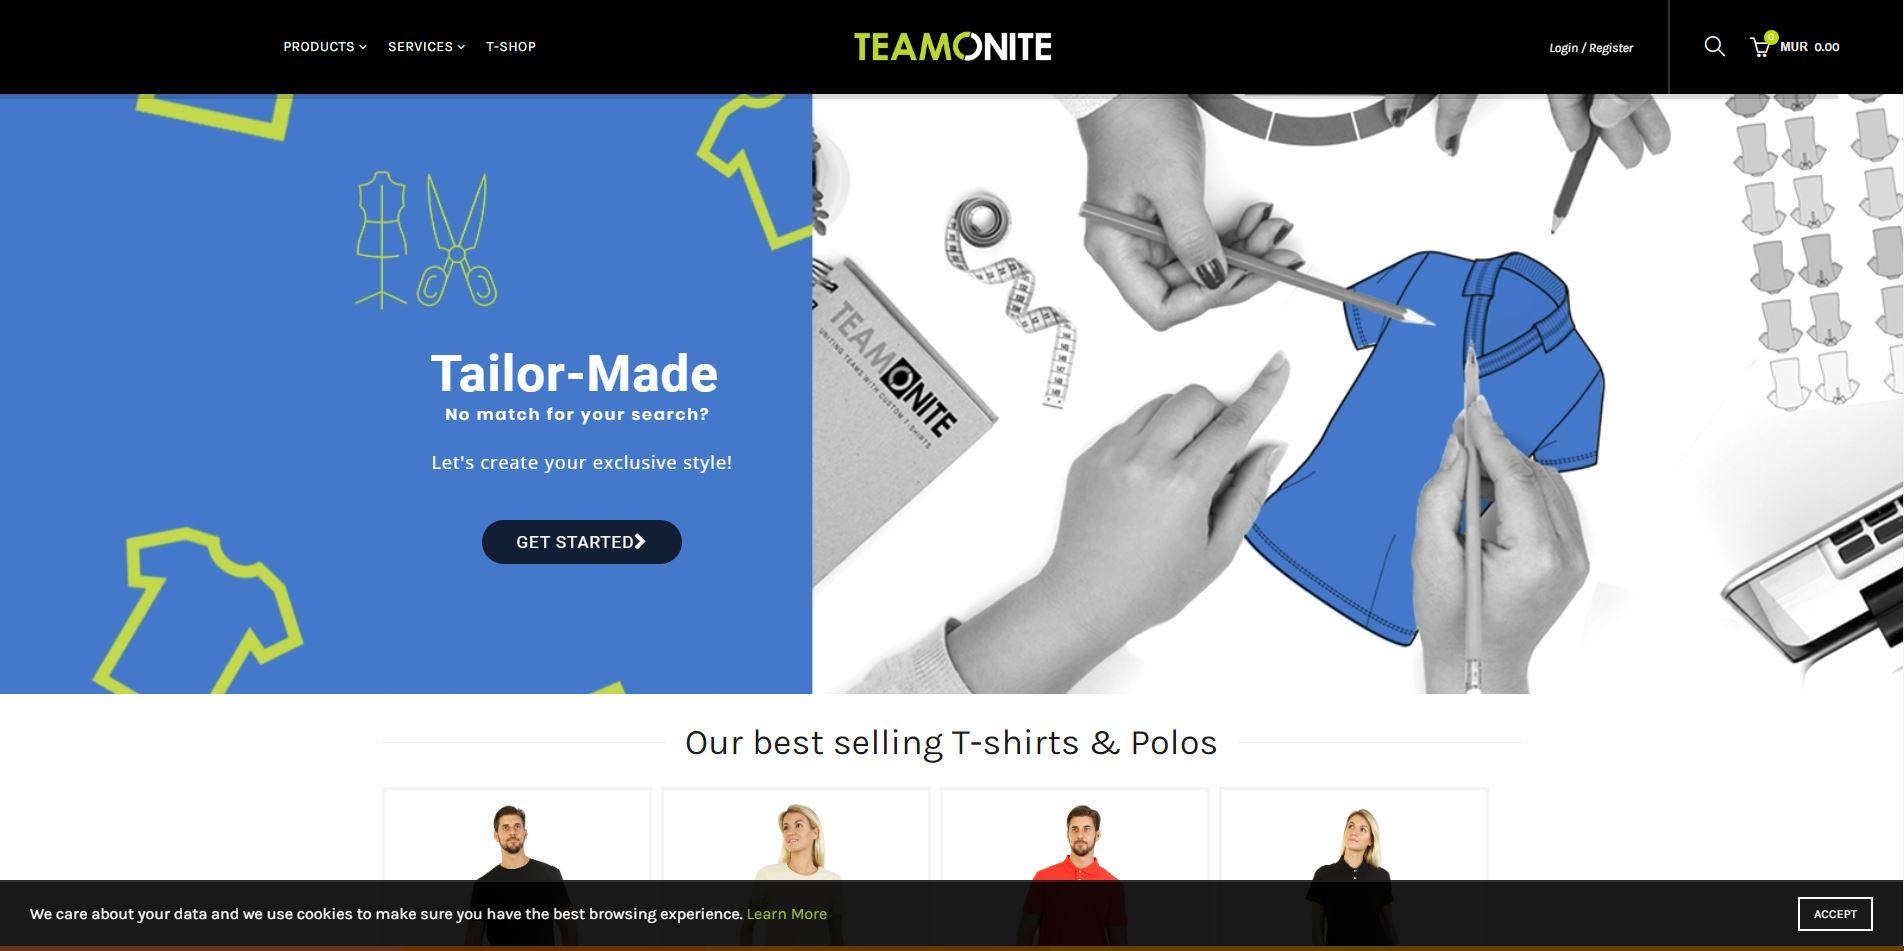 Teamonite-Digital-Marketing-Mauritius-E-commerce